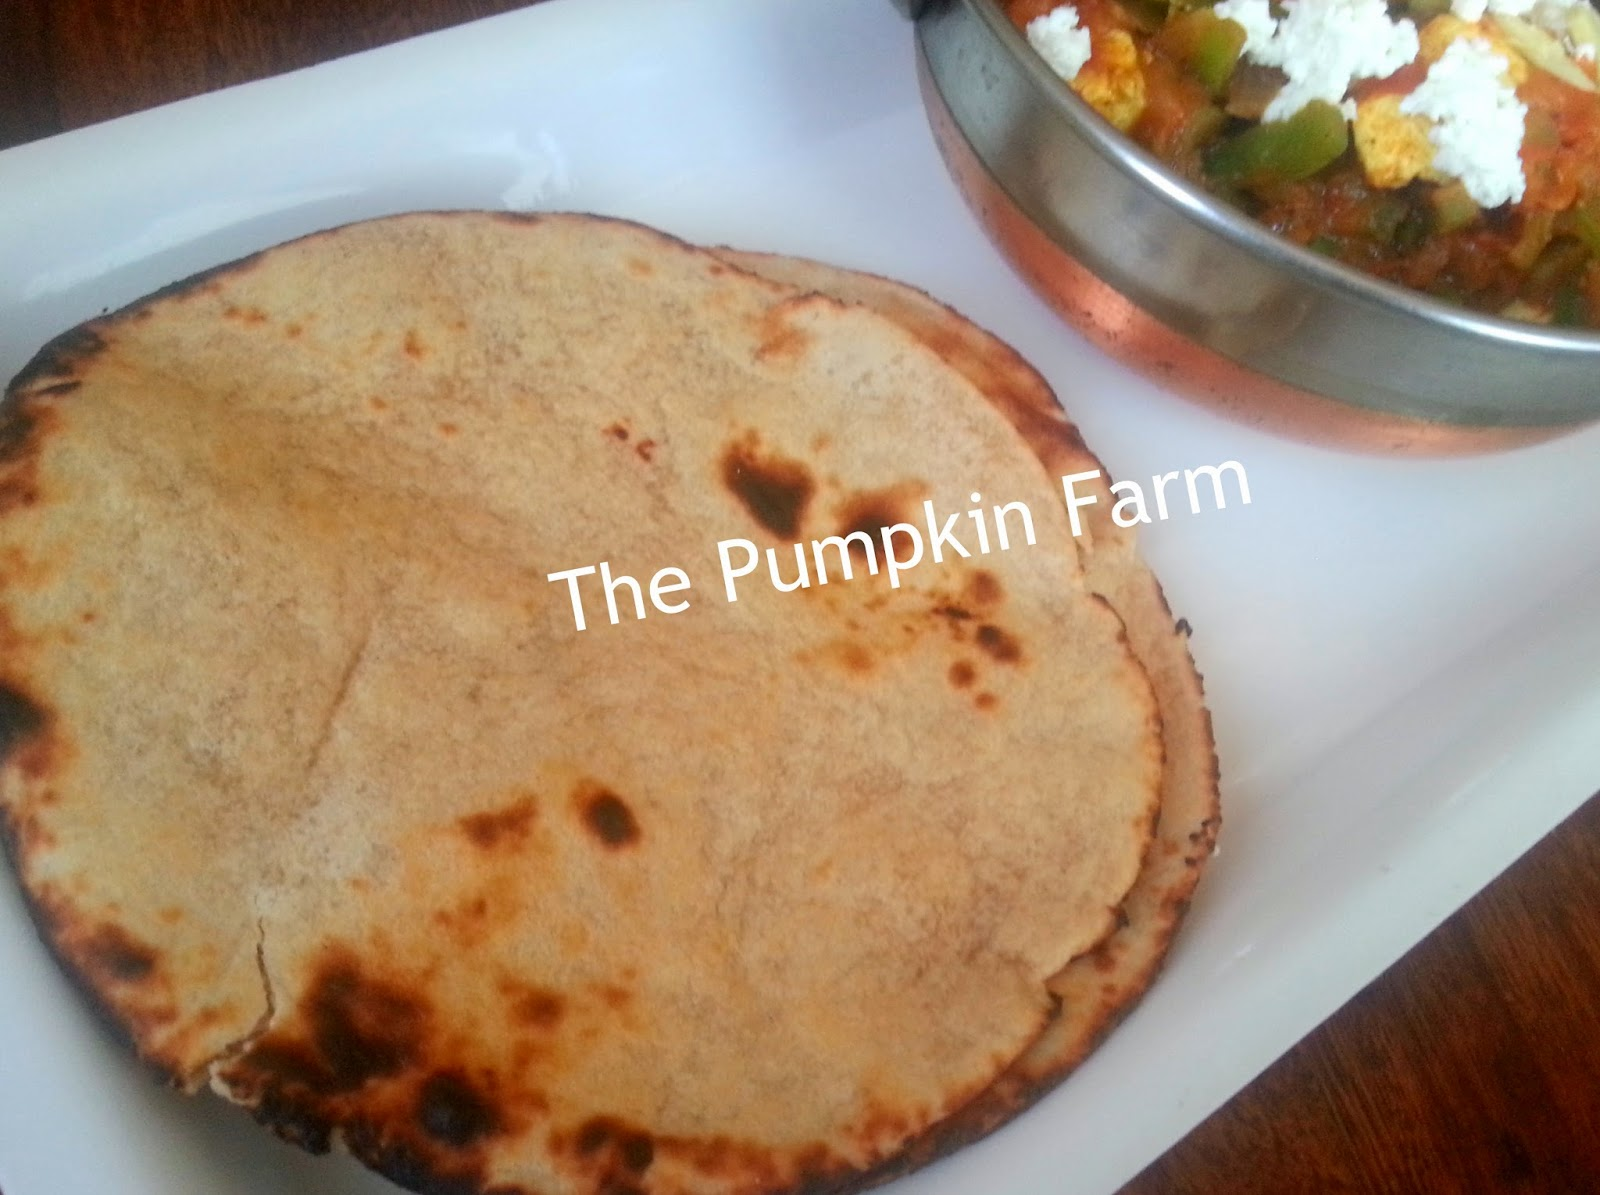 tandoori roti / wheat flour baked roti